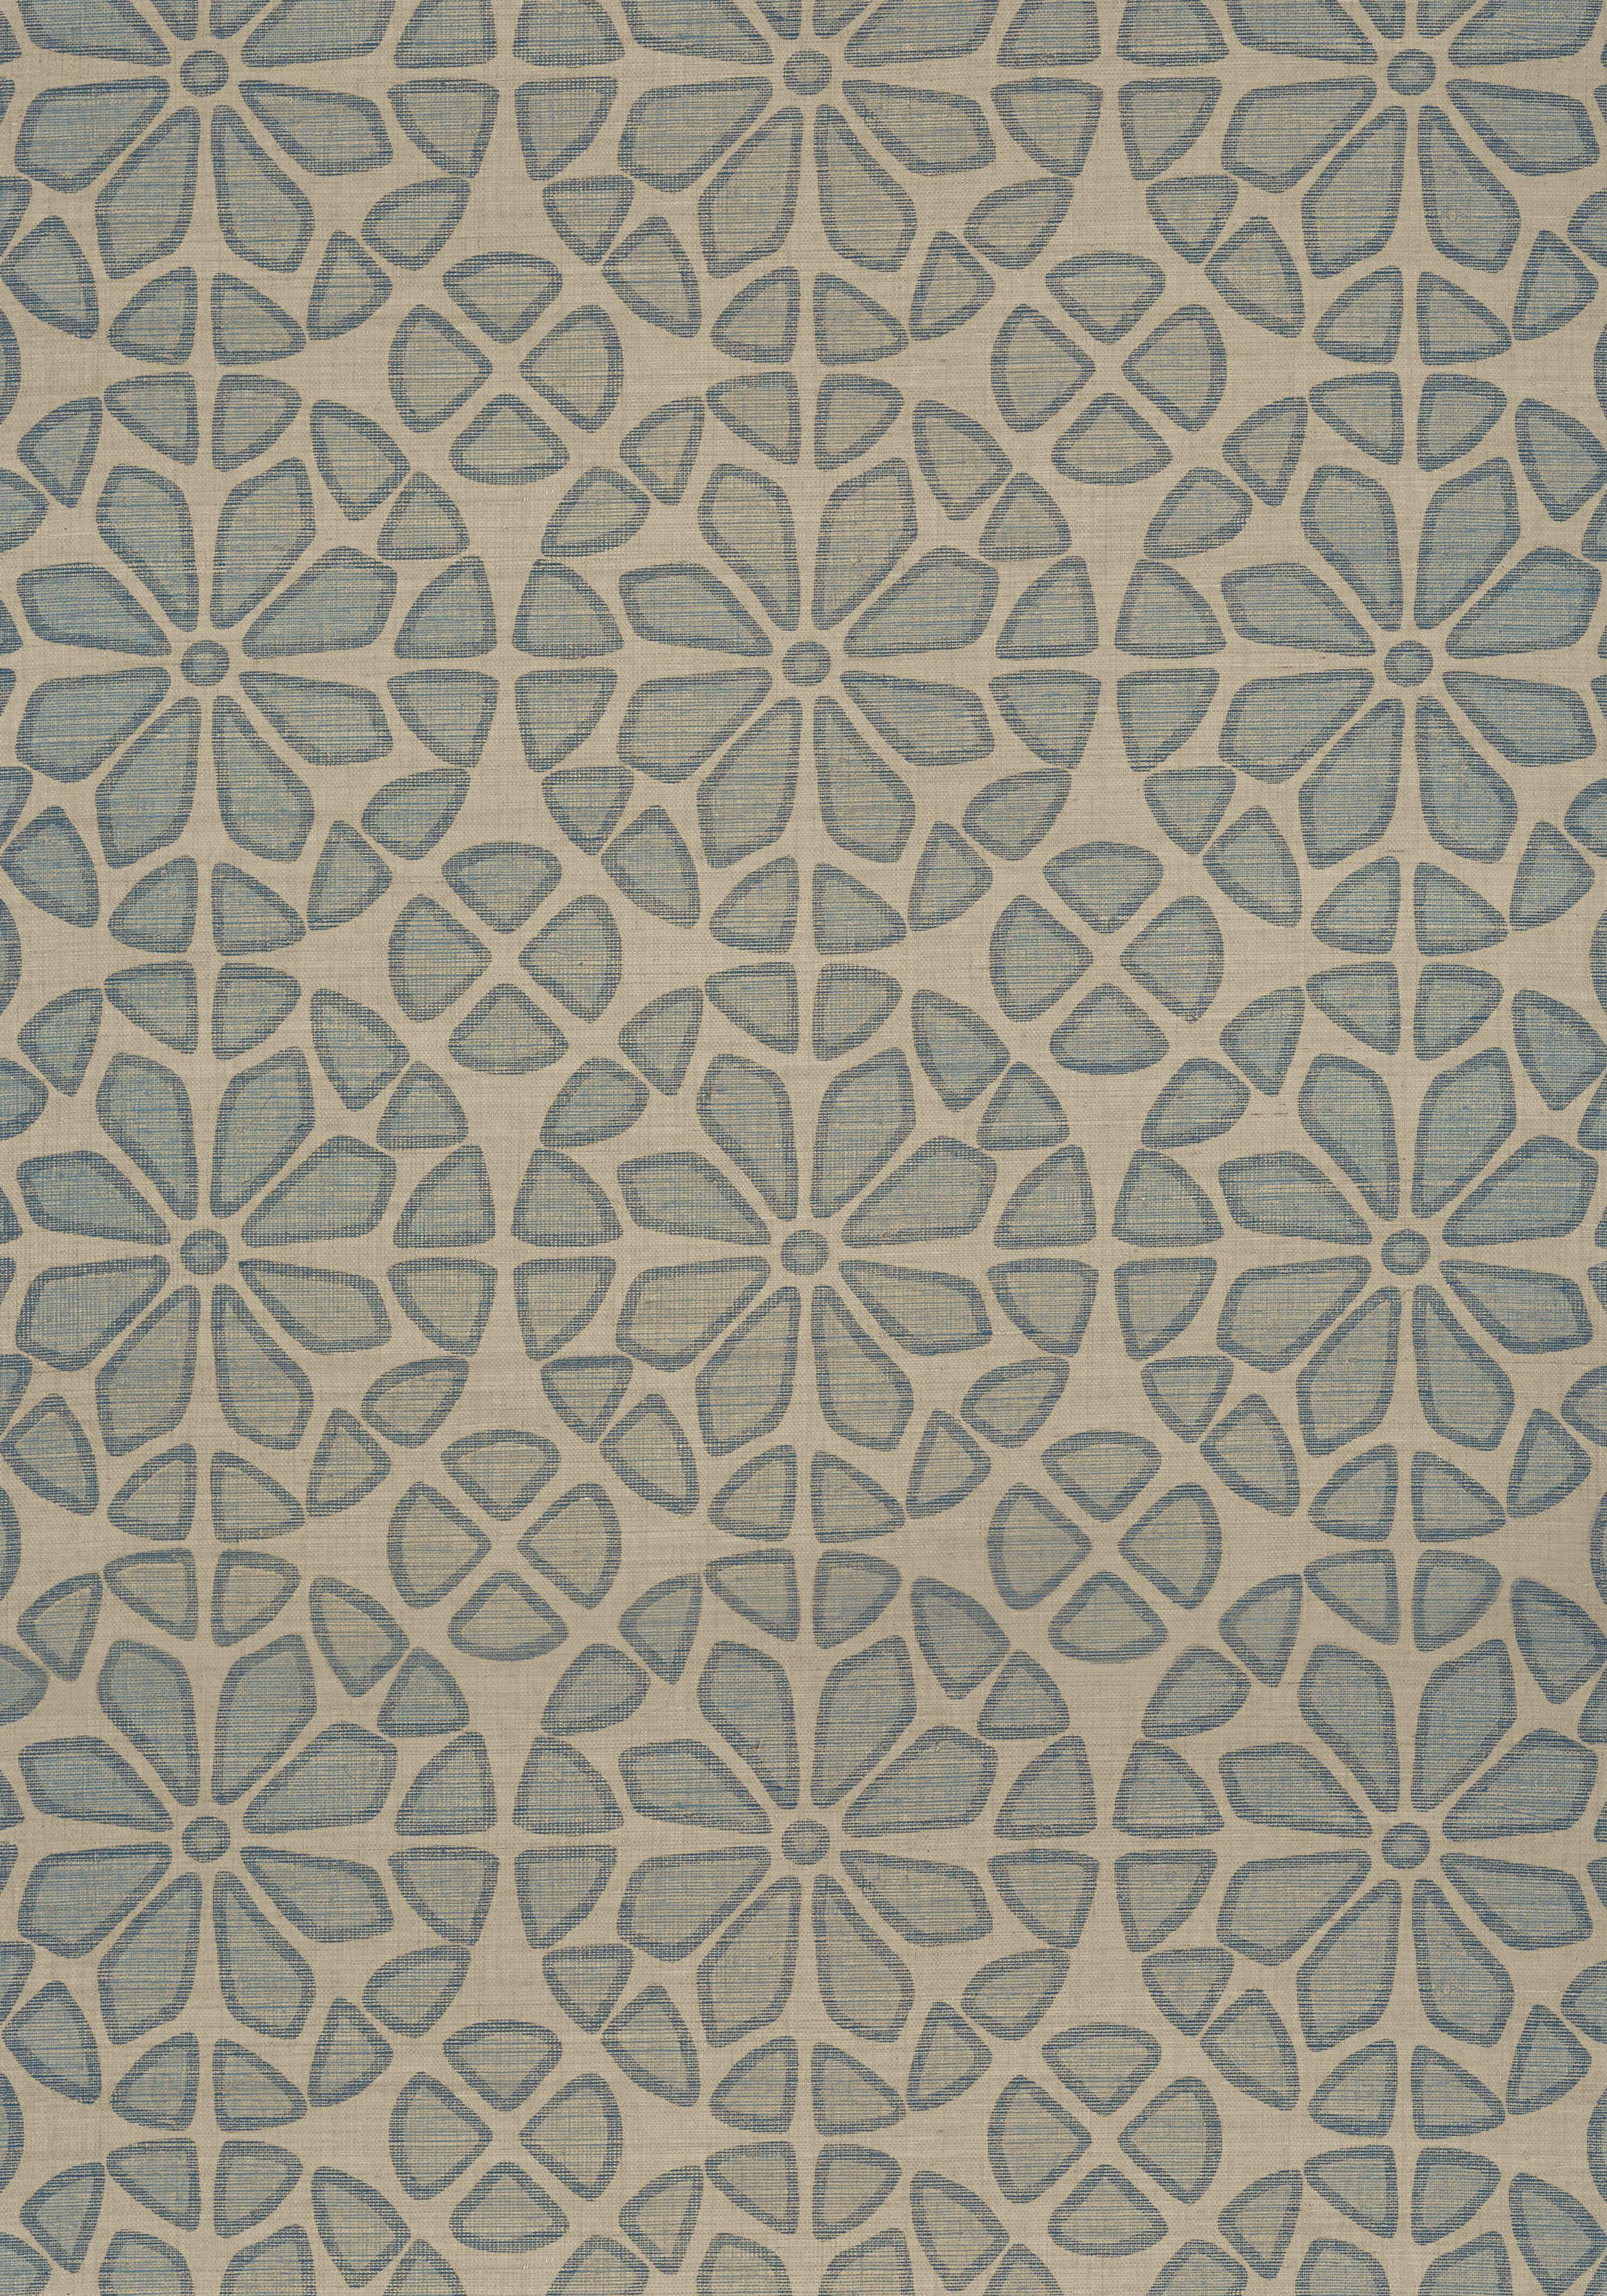 T41156 Grasscloth Thibaut Grasscloth Wallpaper